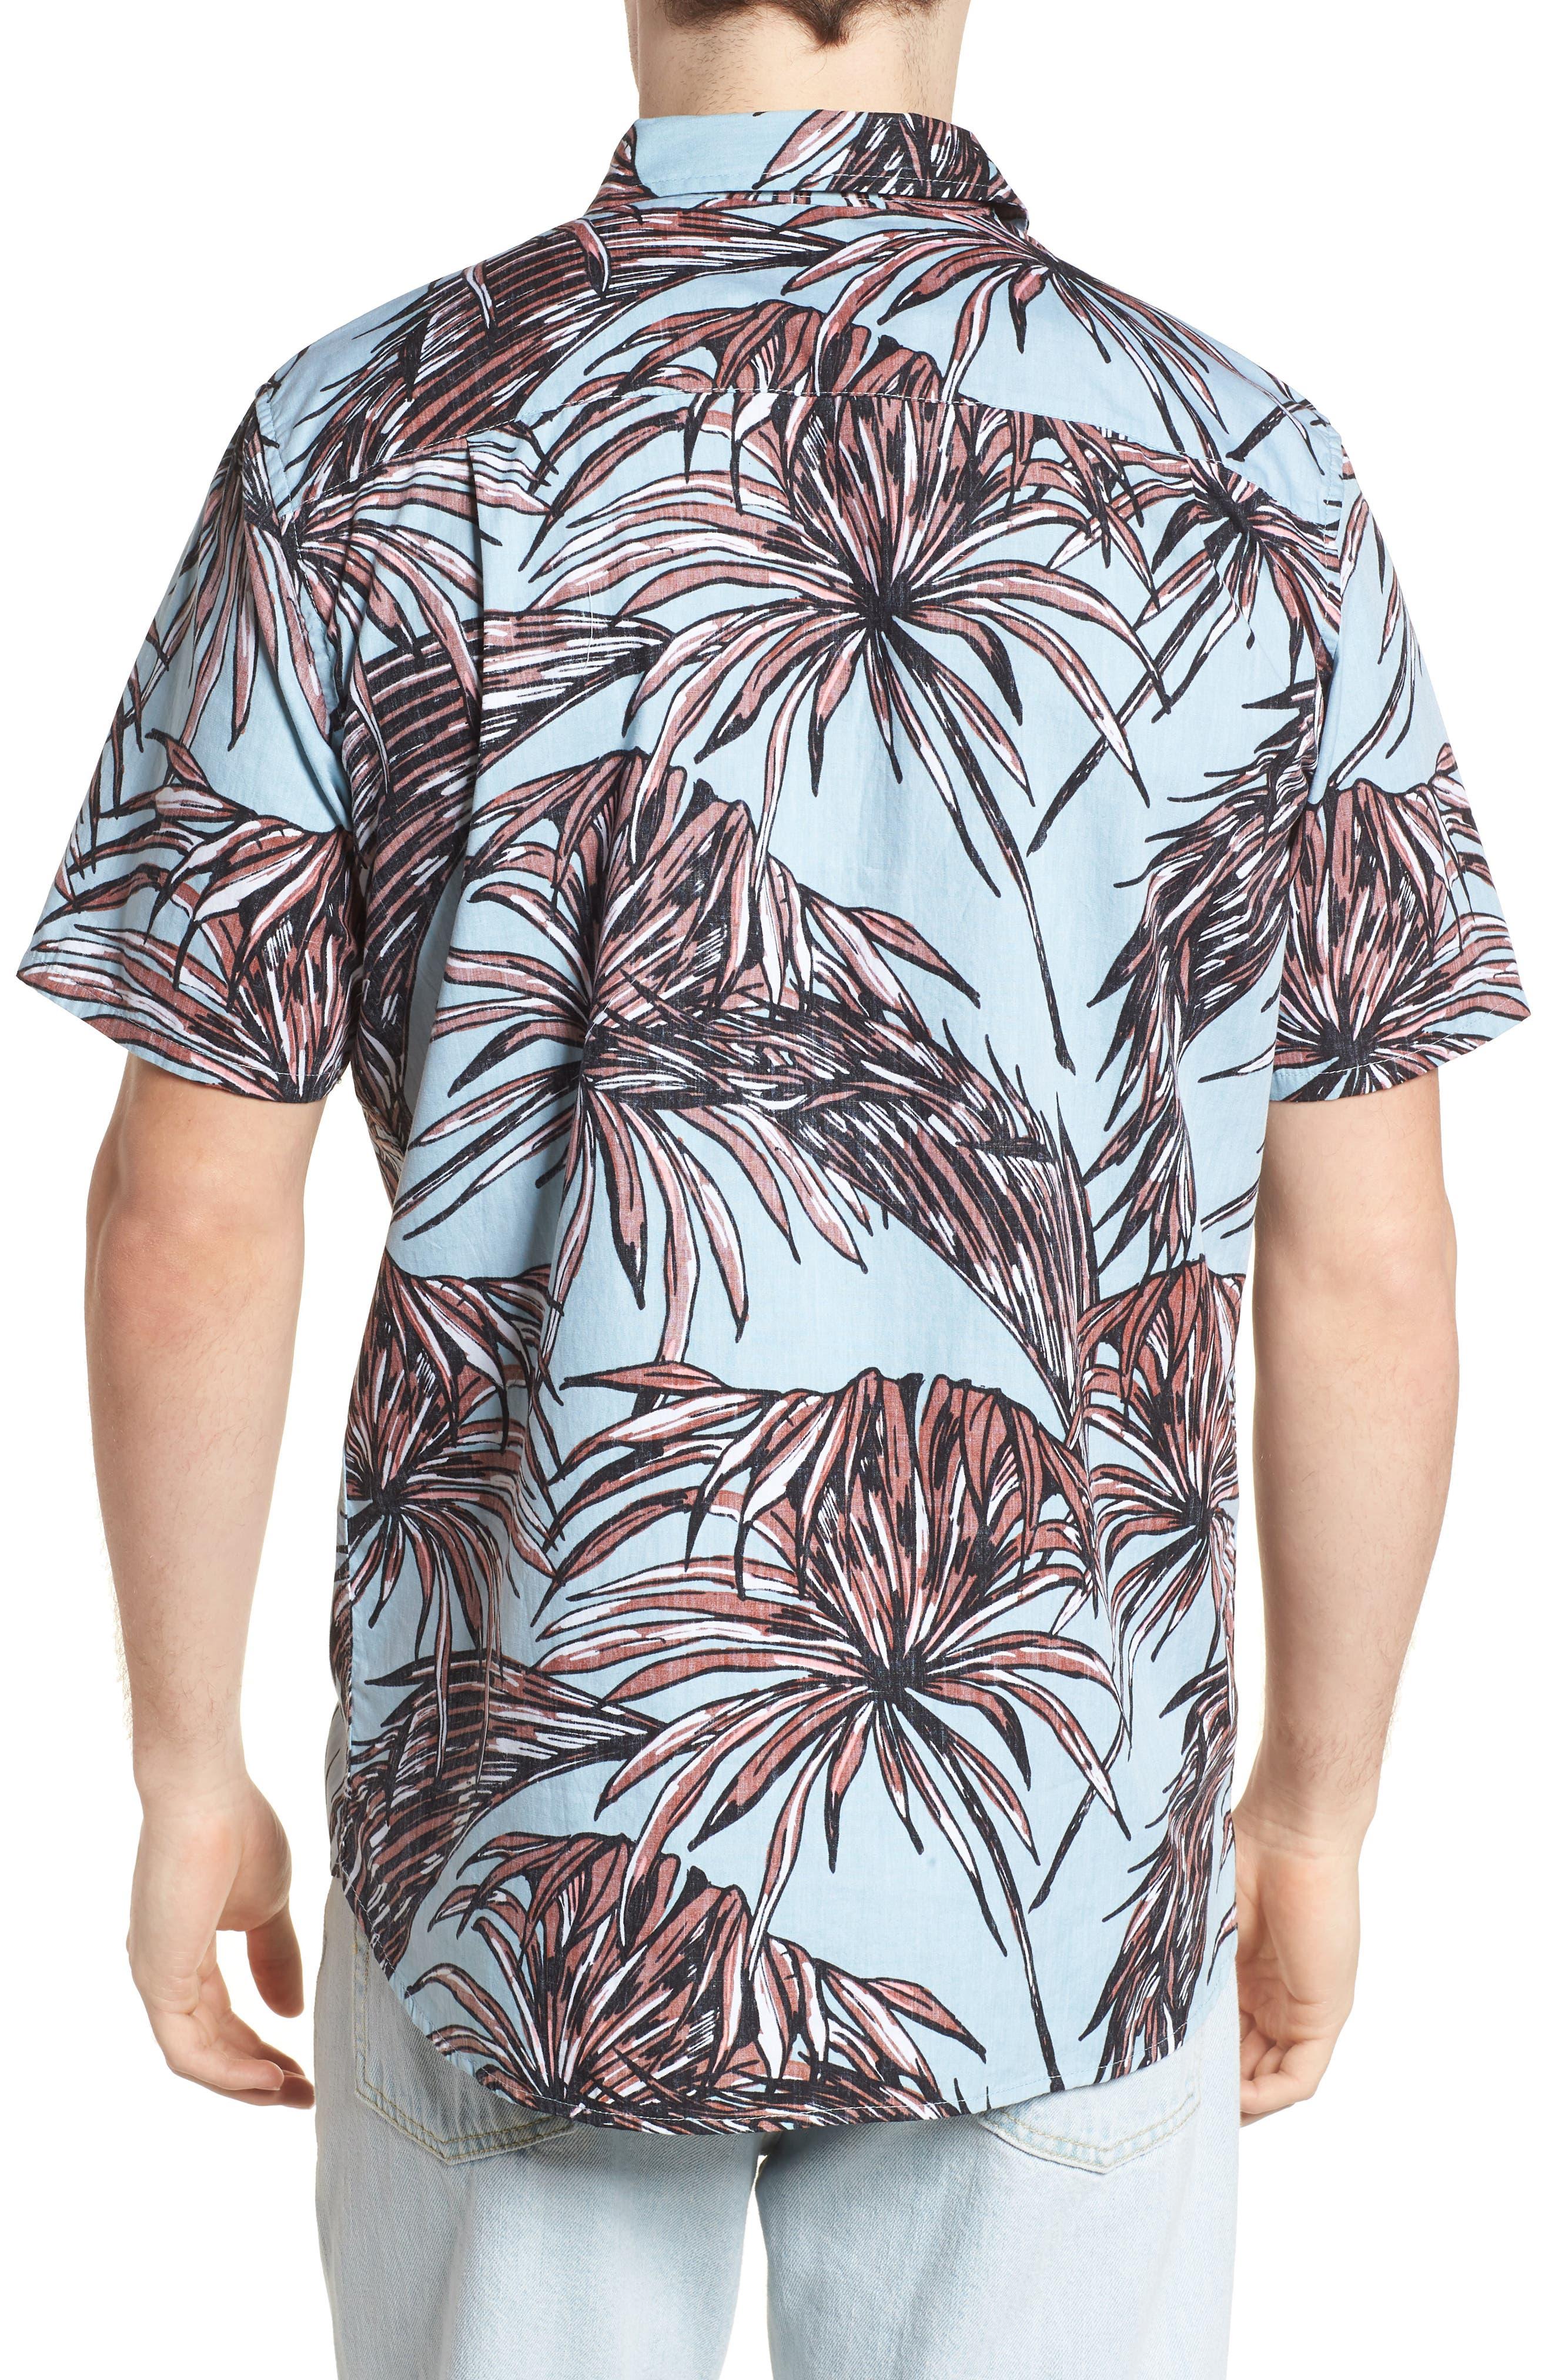 Koko Shirt,                             Alternate thumbnail 3, color,                             Ocean Bliss